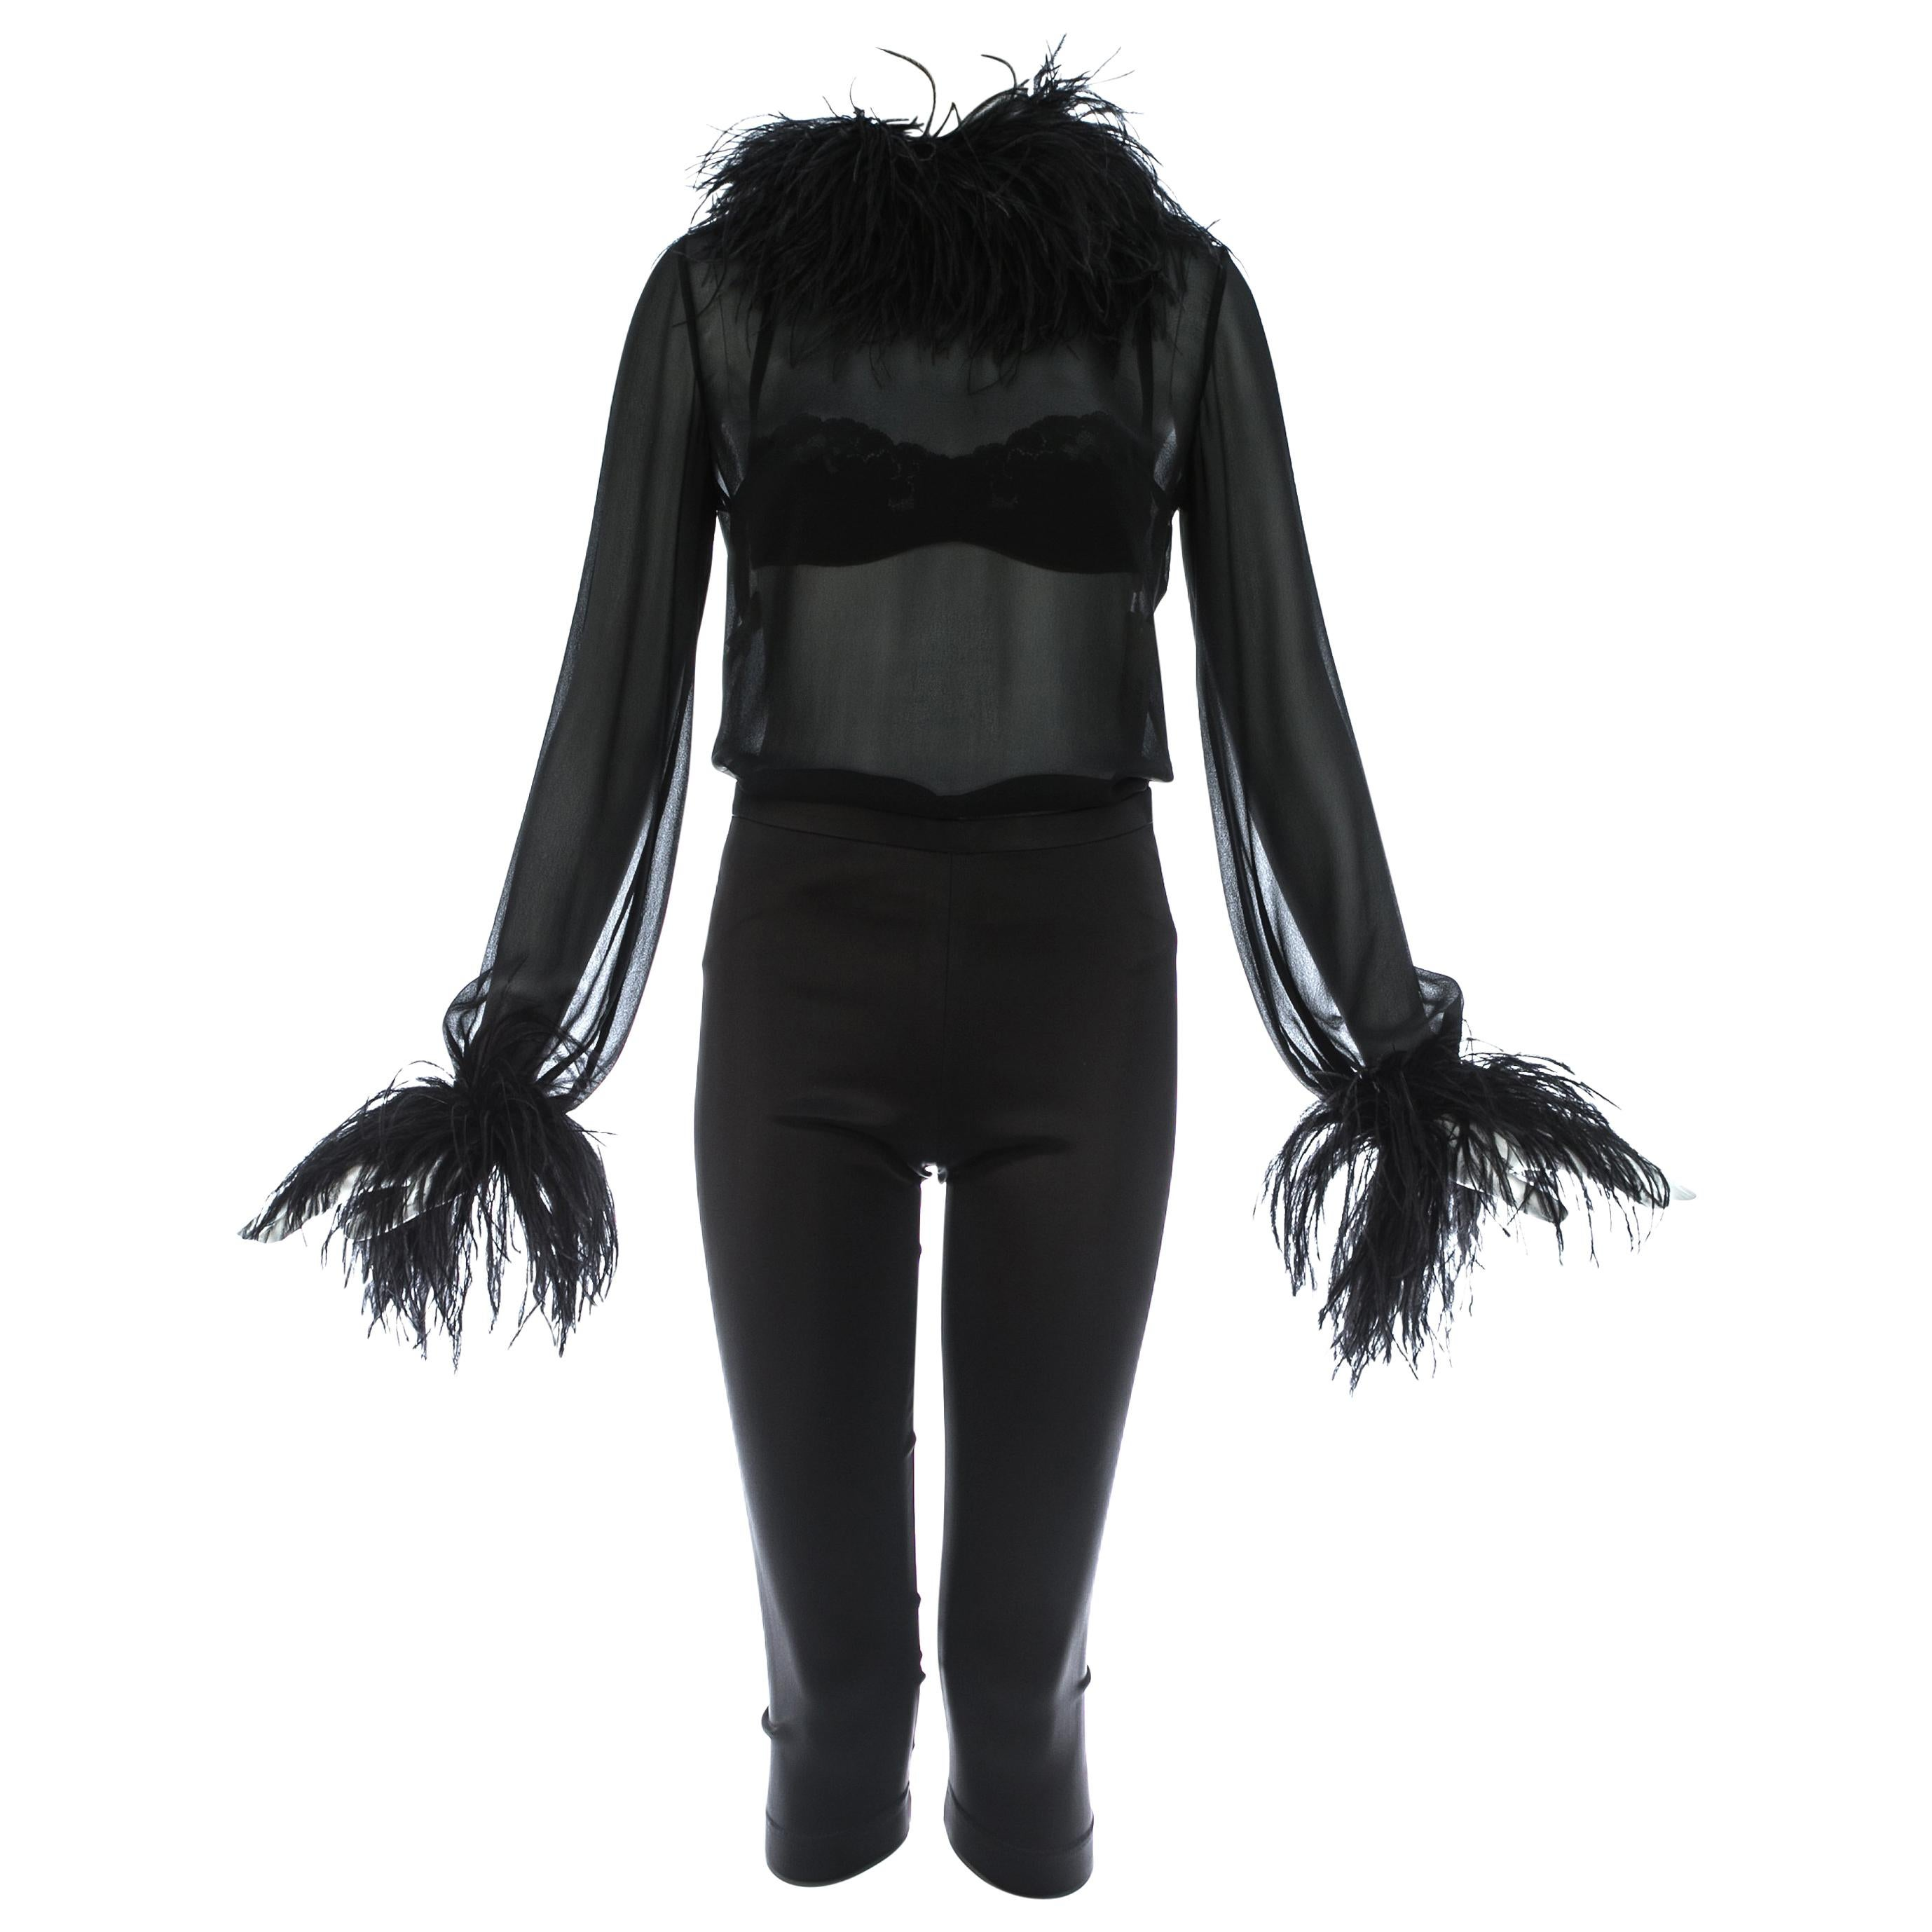 Dolce & Gabbana black 3-piece ensemble with ostrich feathers, A/W 1995